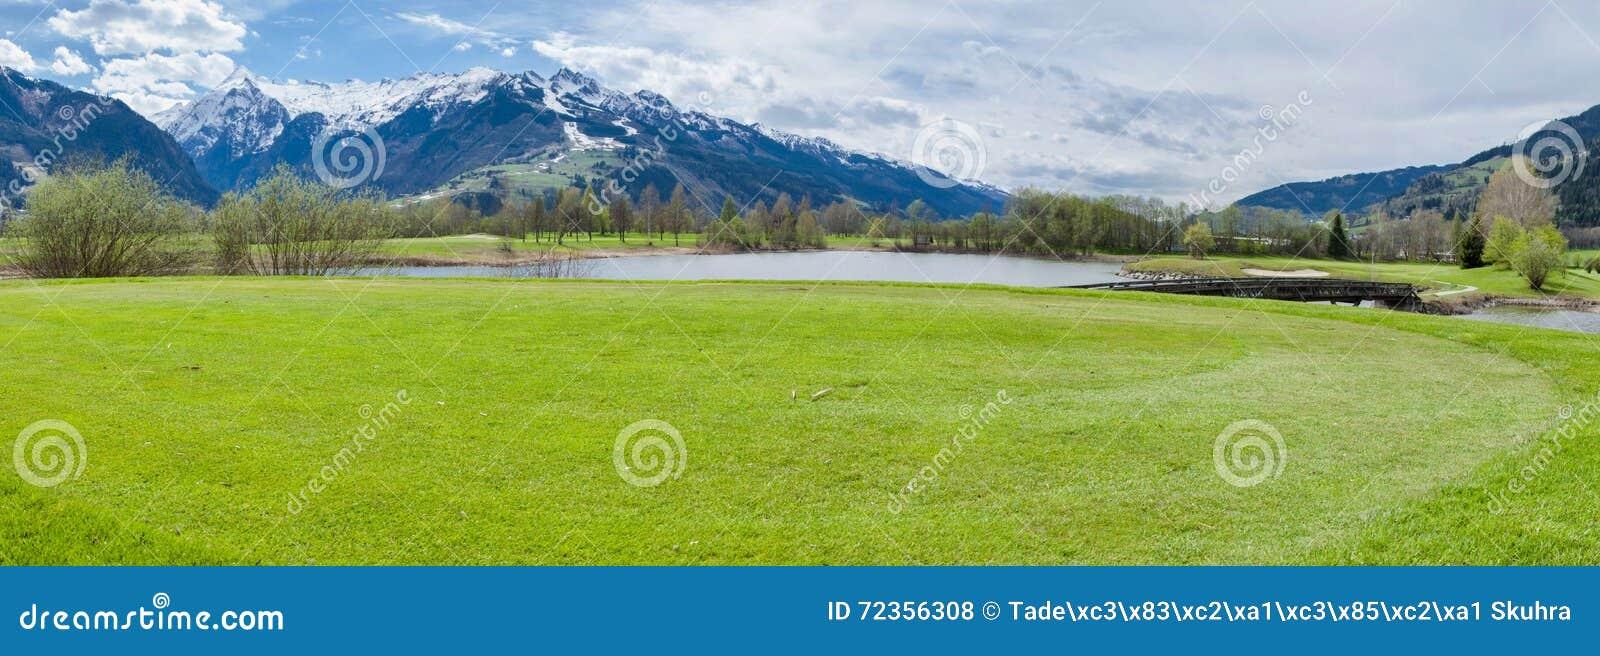 Golfplatz in den Bergen